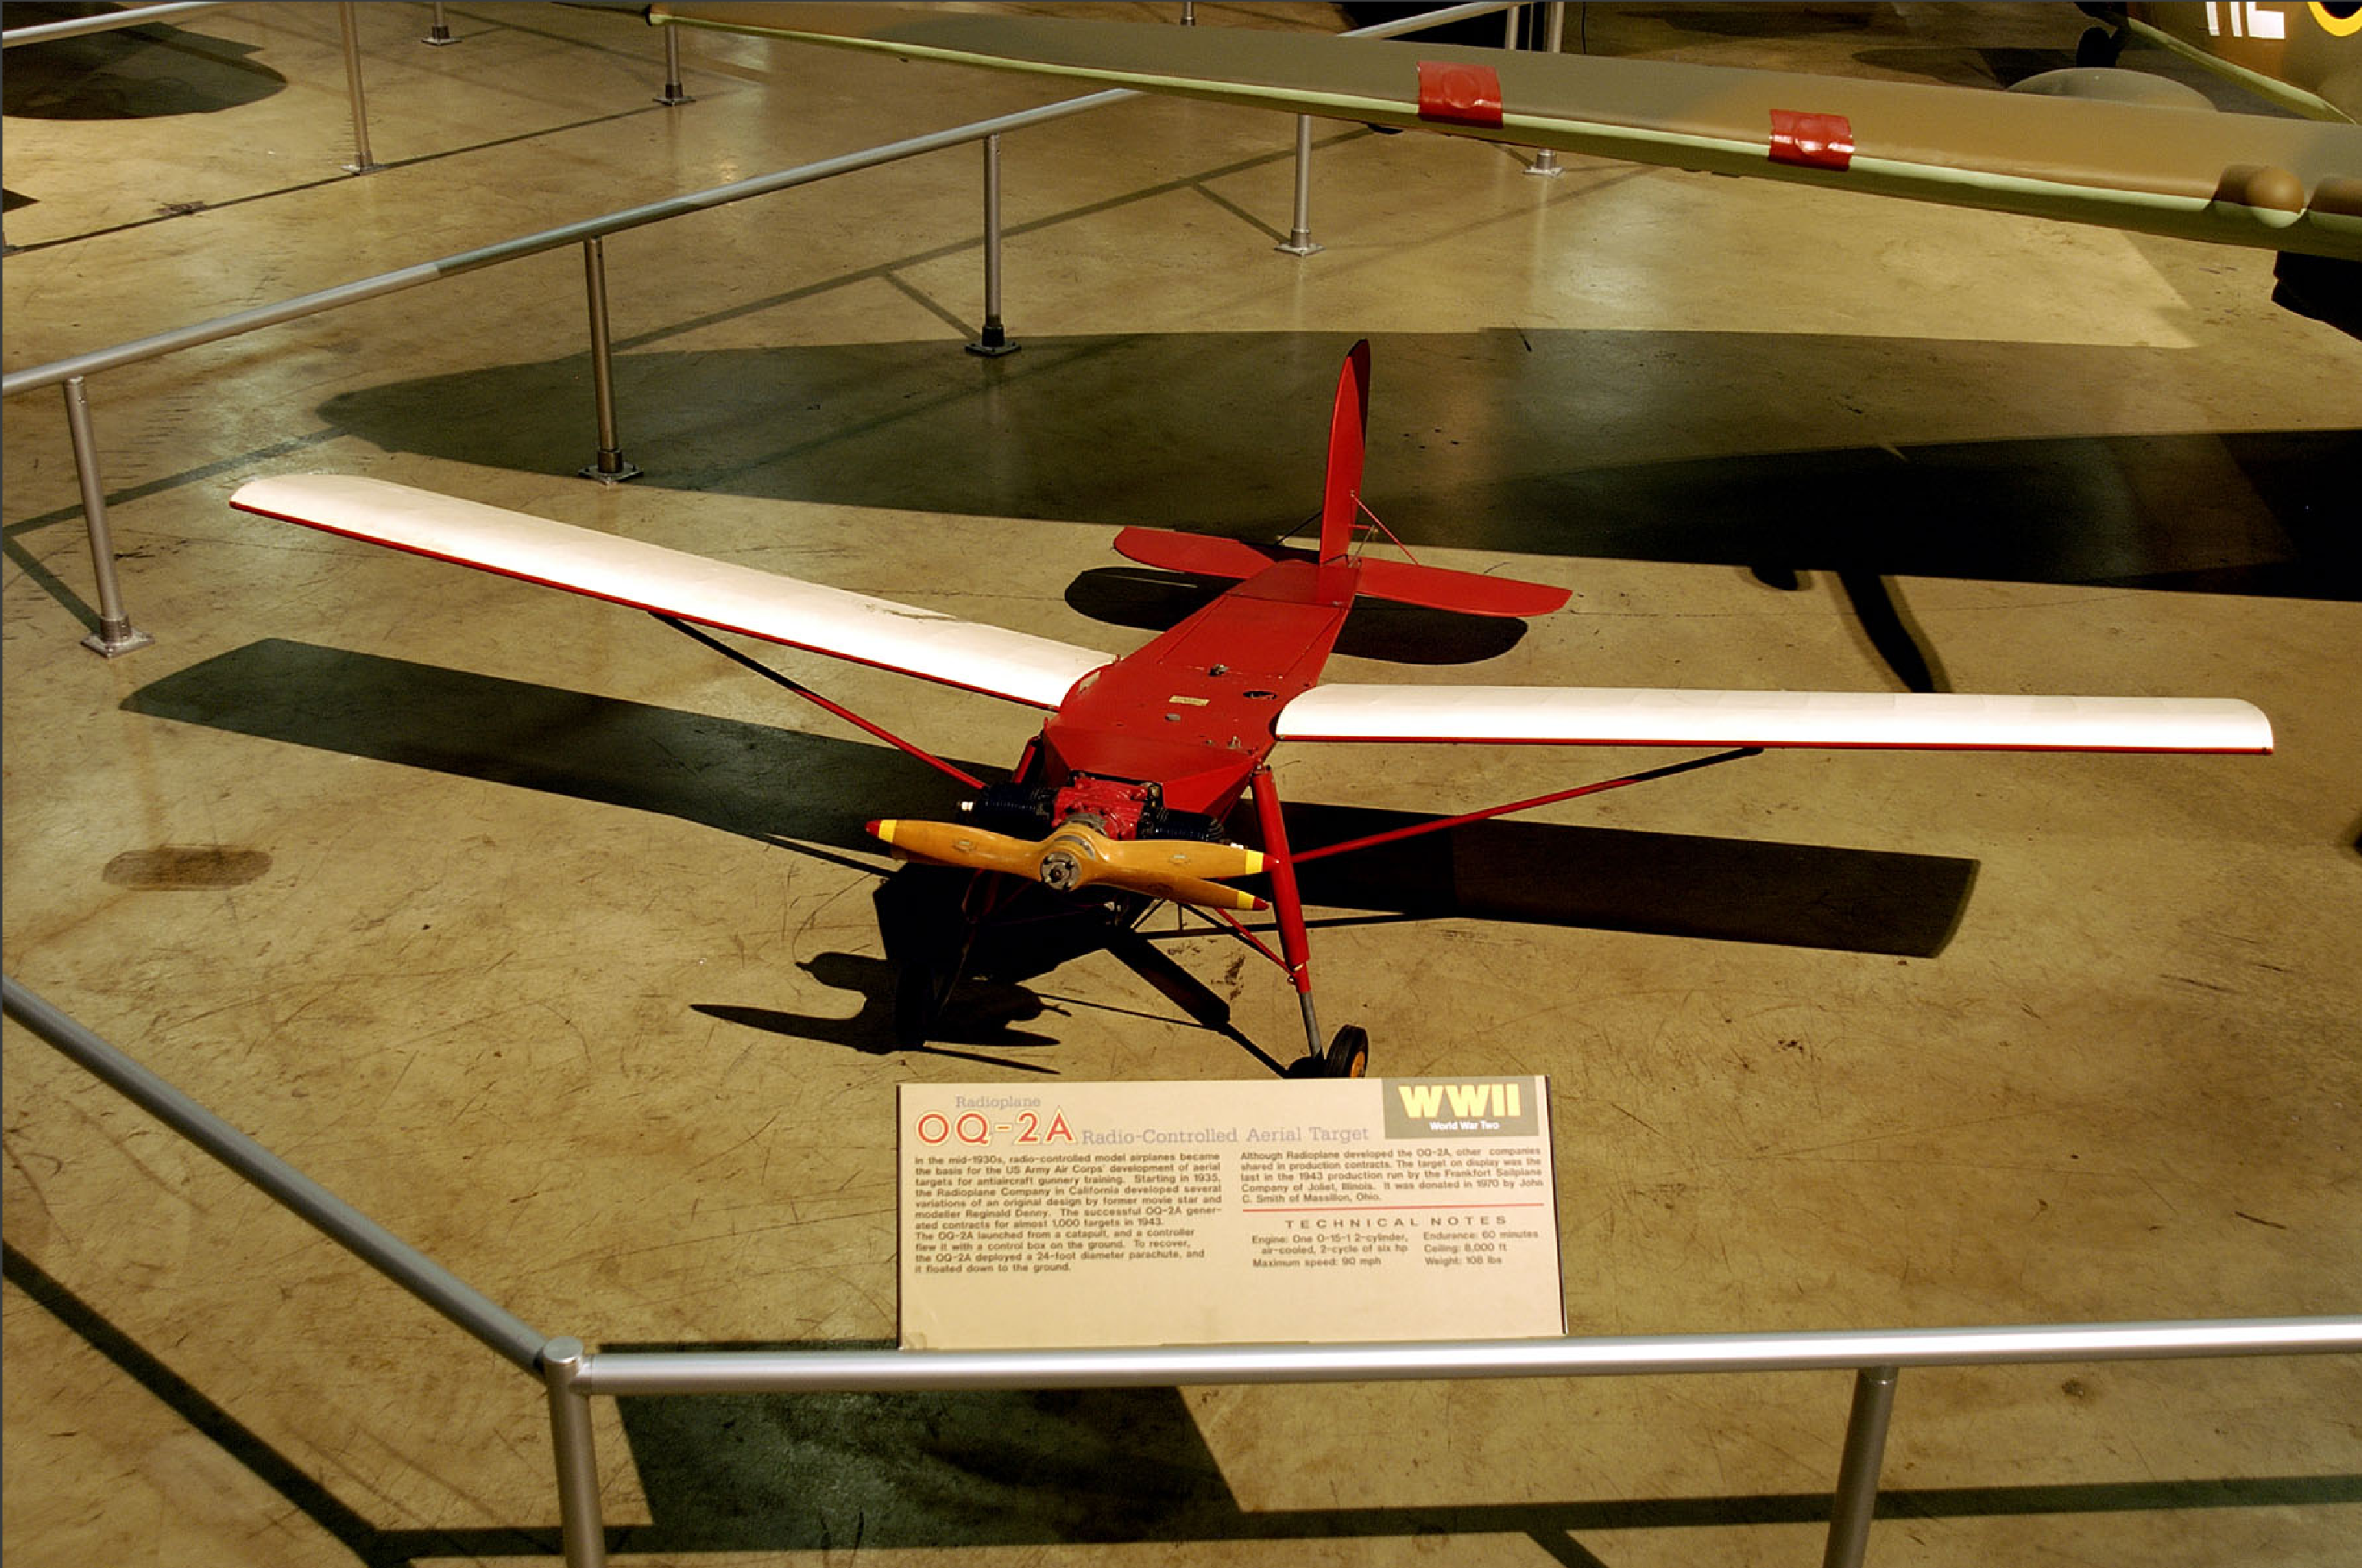 Radioplane OQ-2A